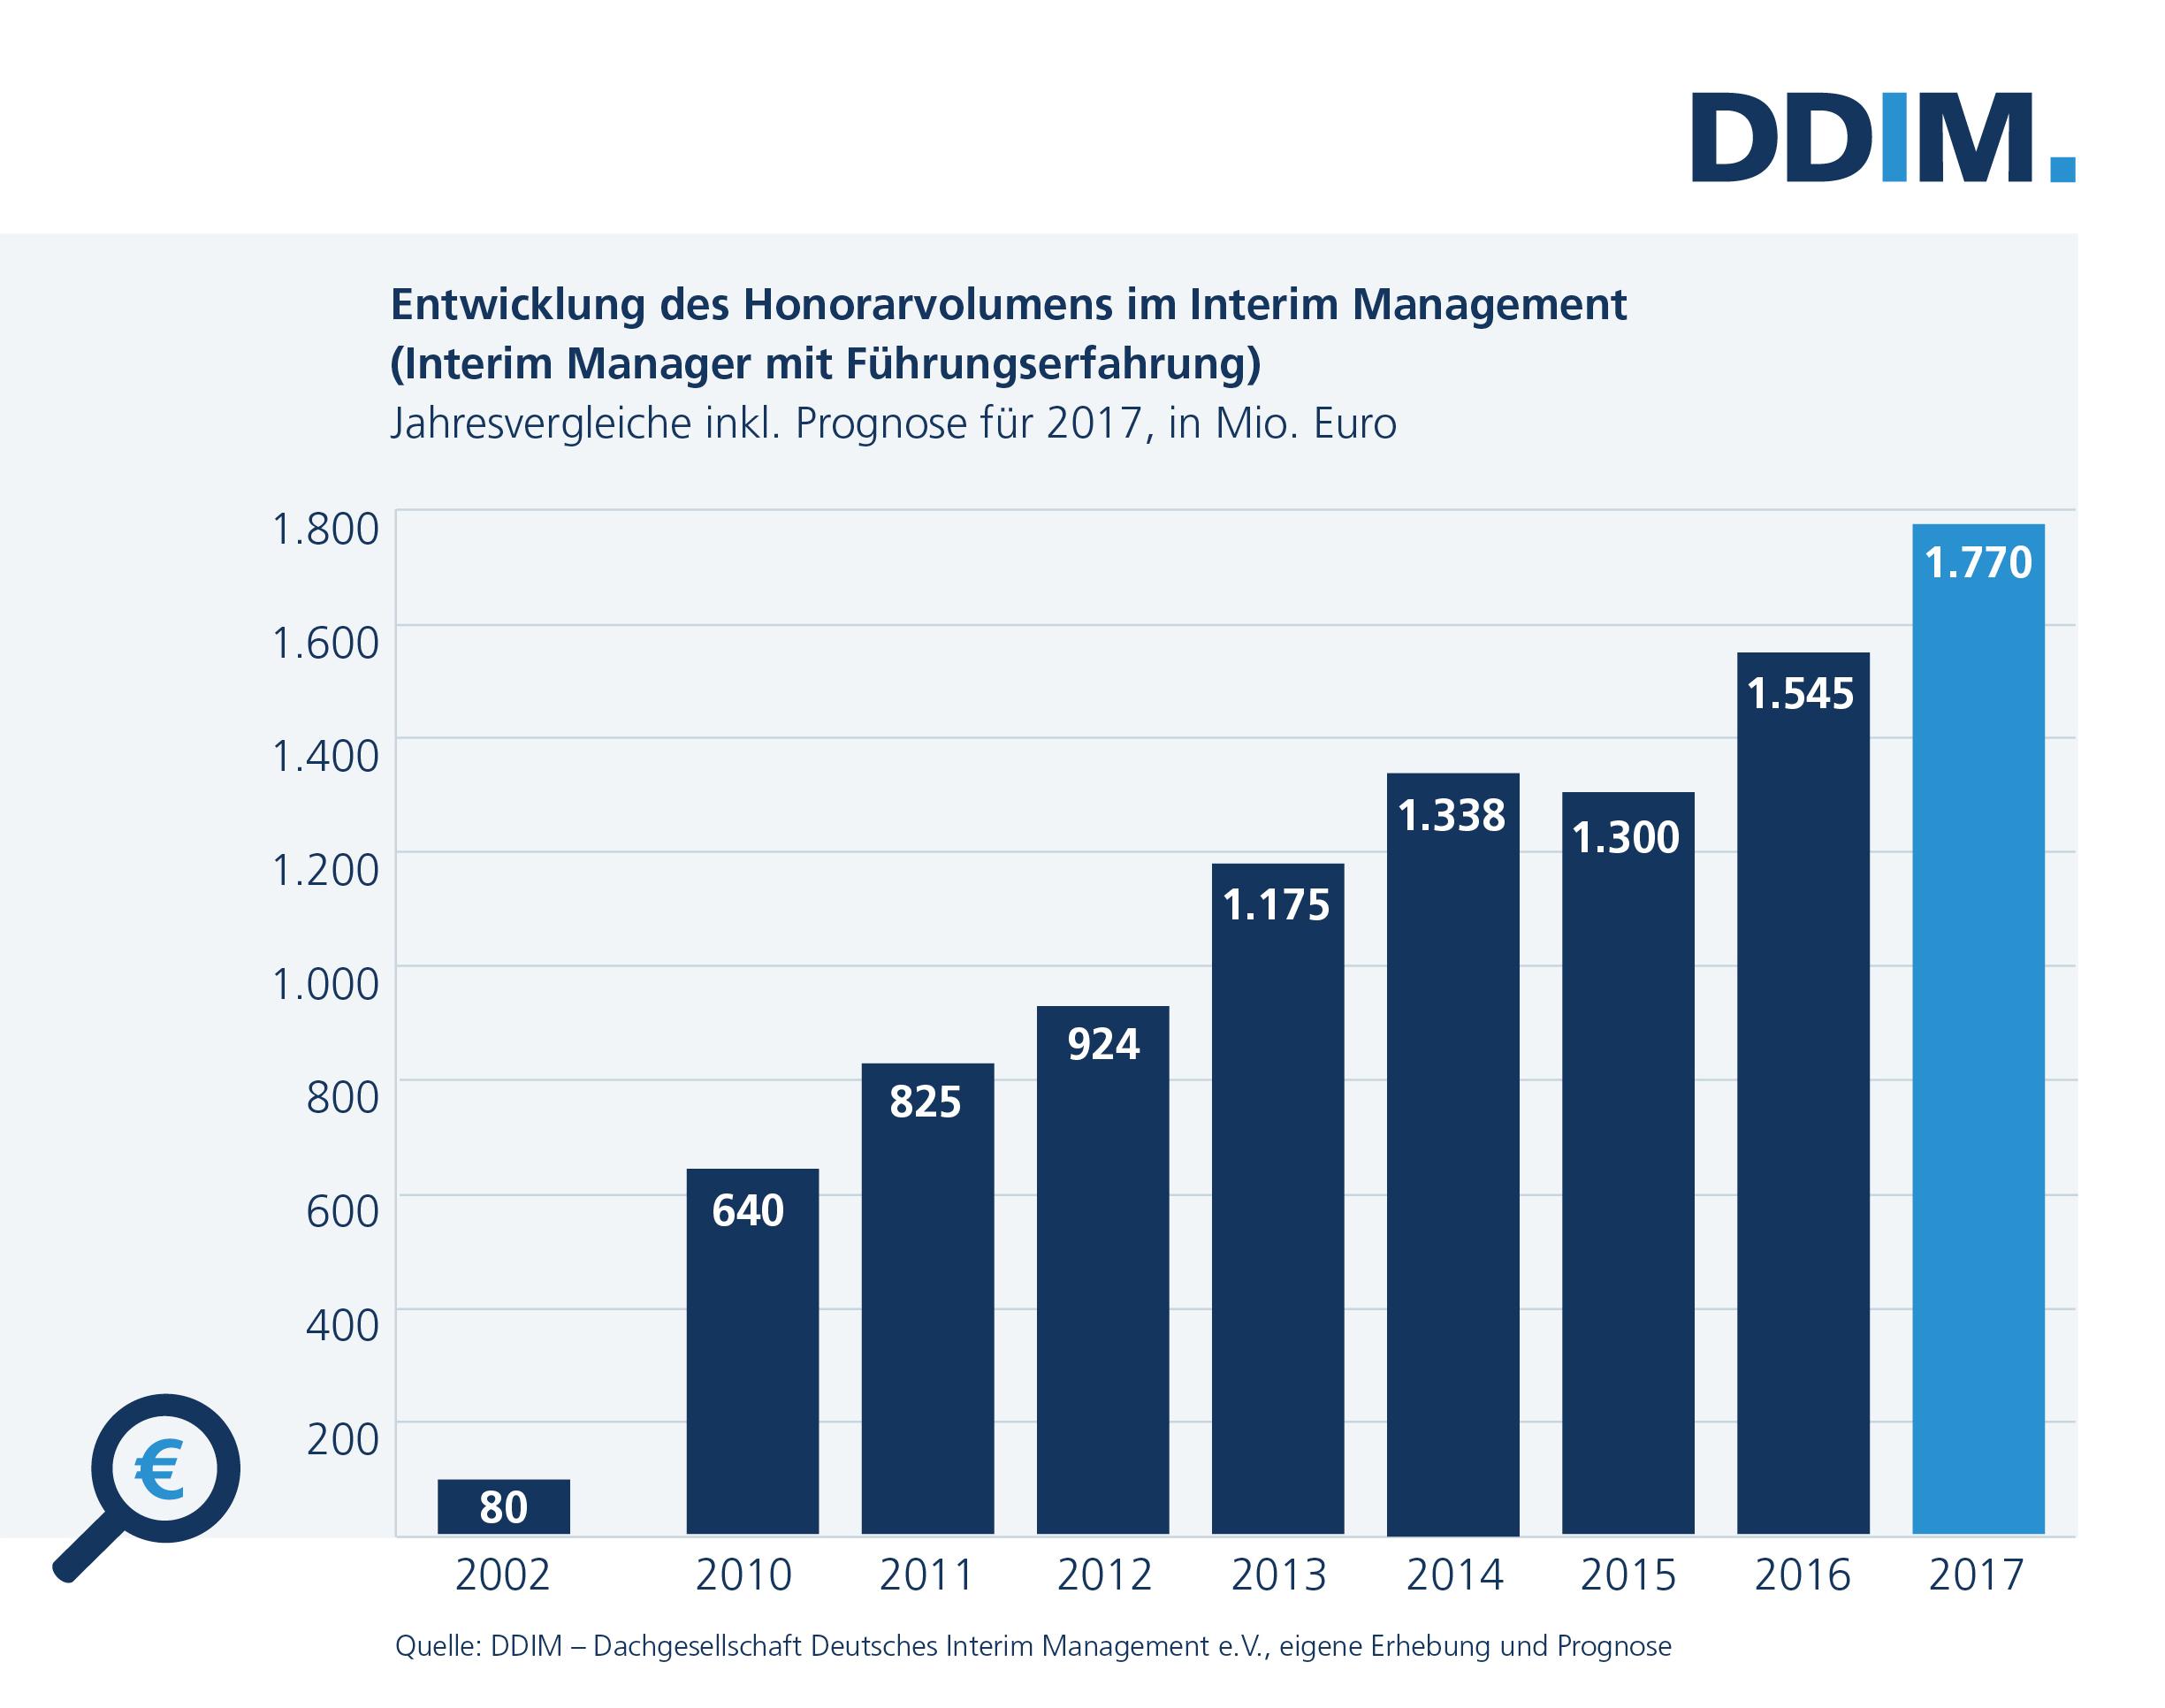 Erfolgsmodell Interim Management etabliert:   Markt wächst 2017 erneut um knapp 15 Prozent